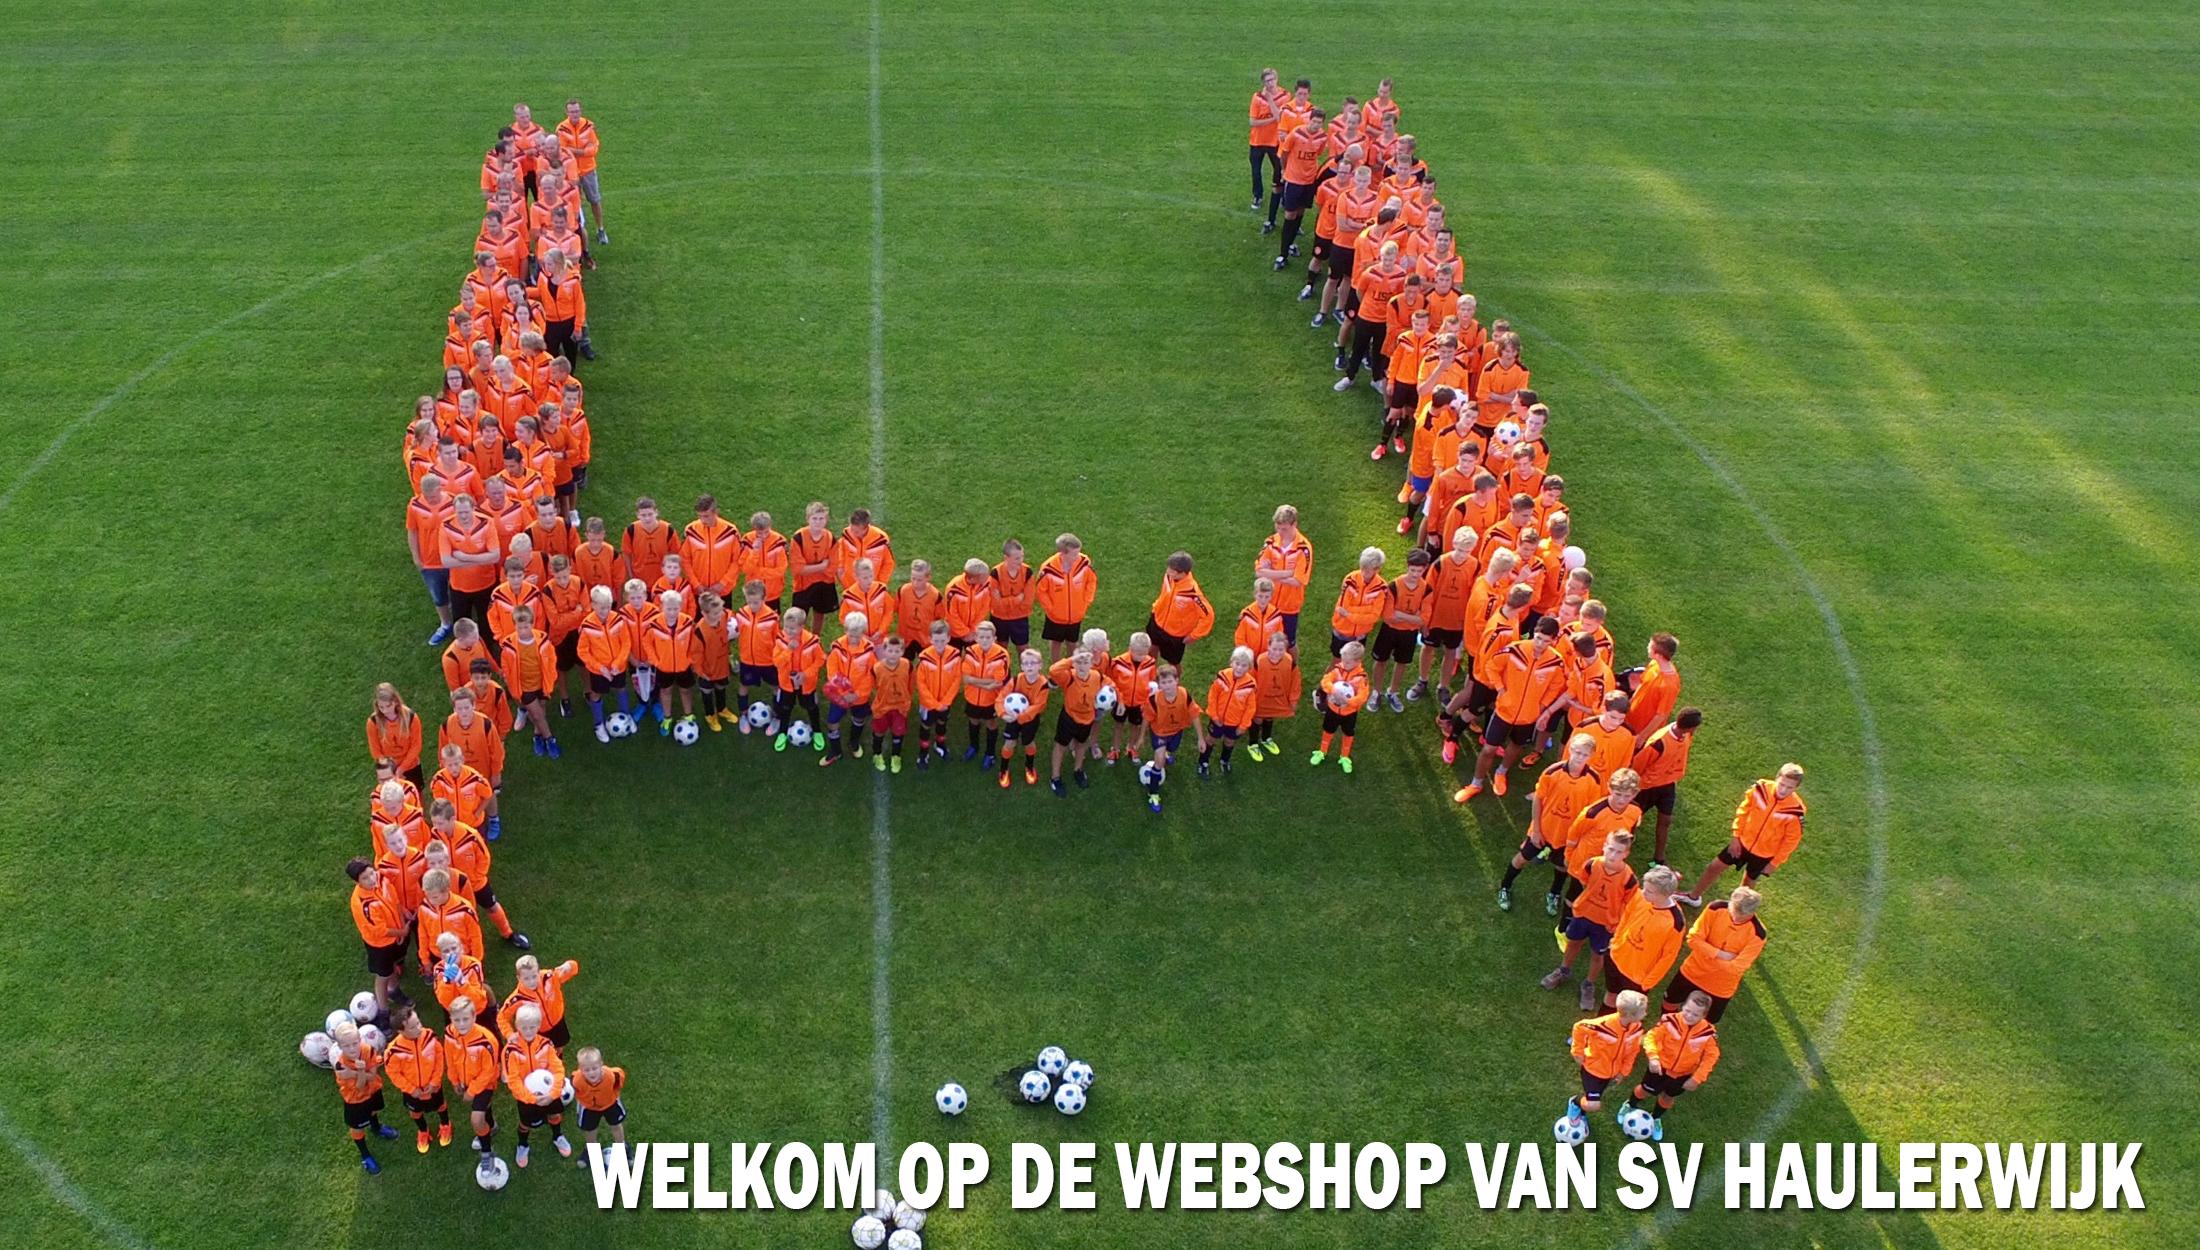 SV Haulerwijk